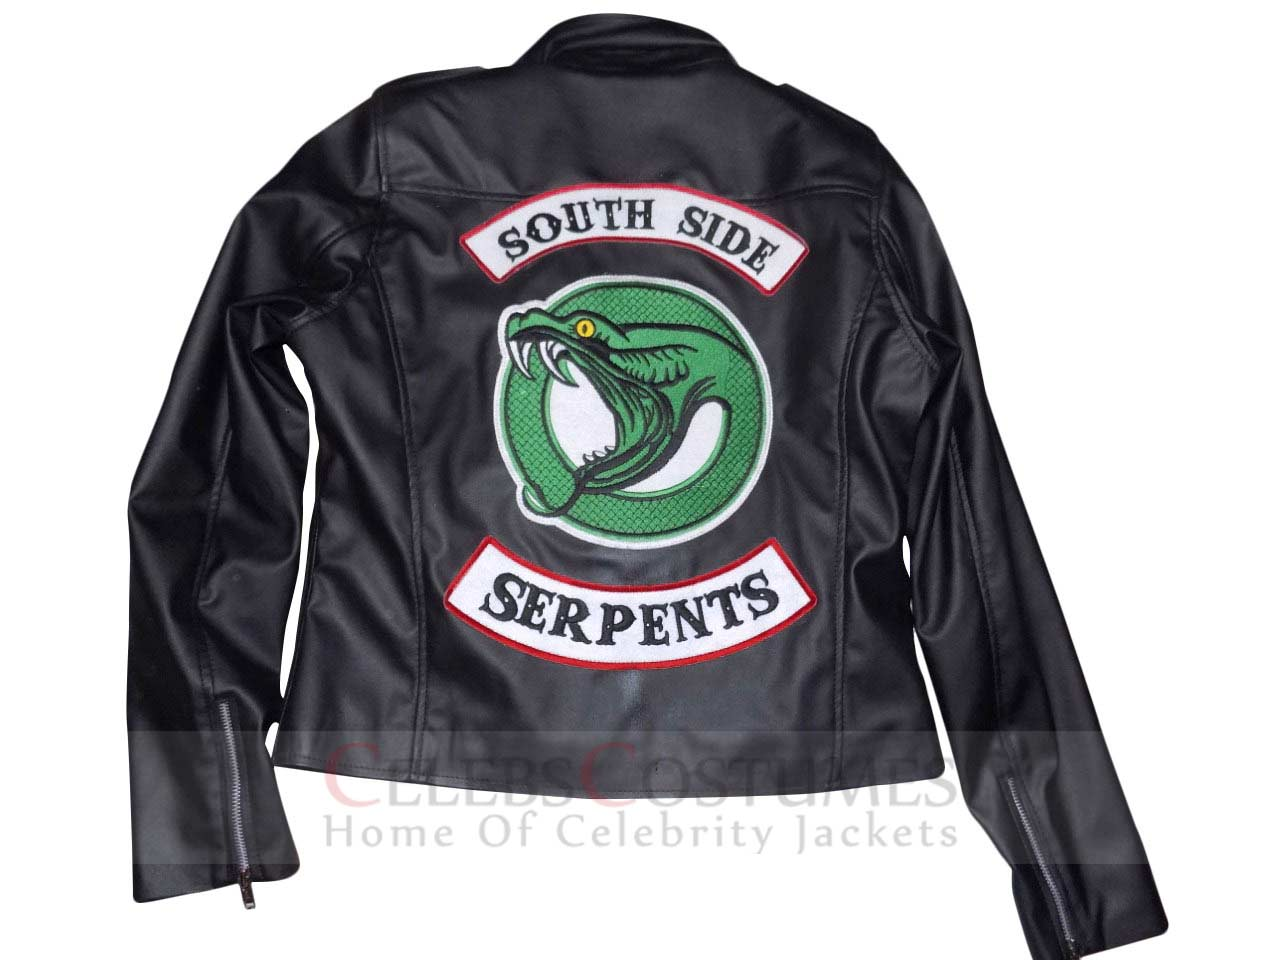 Riverdale Vanessa Morgan Serpents Jacket Southside